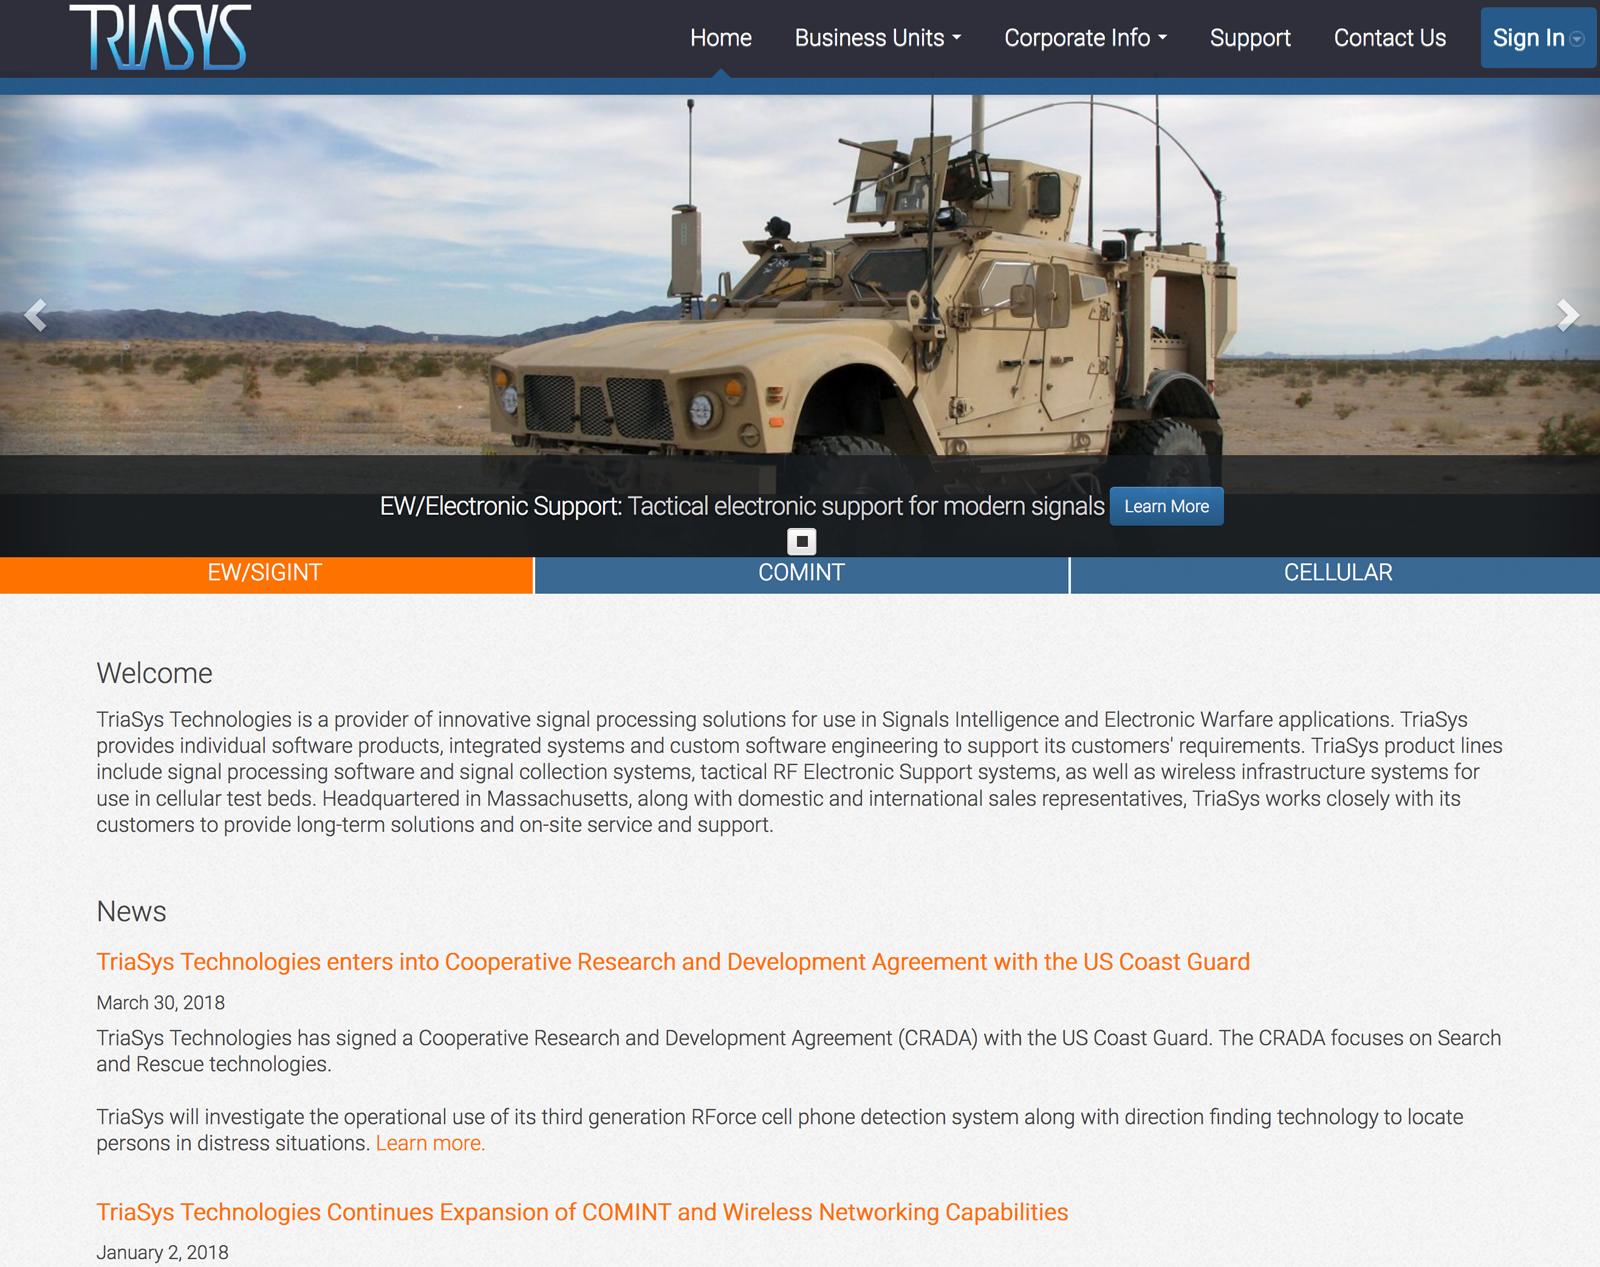 Triasys website